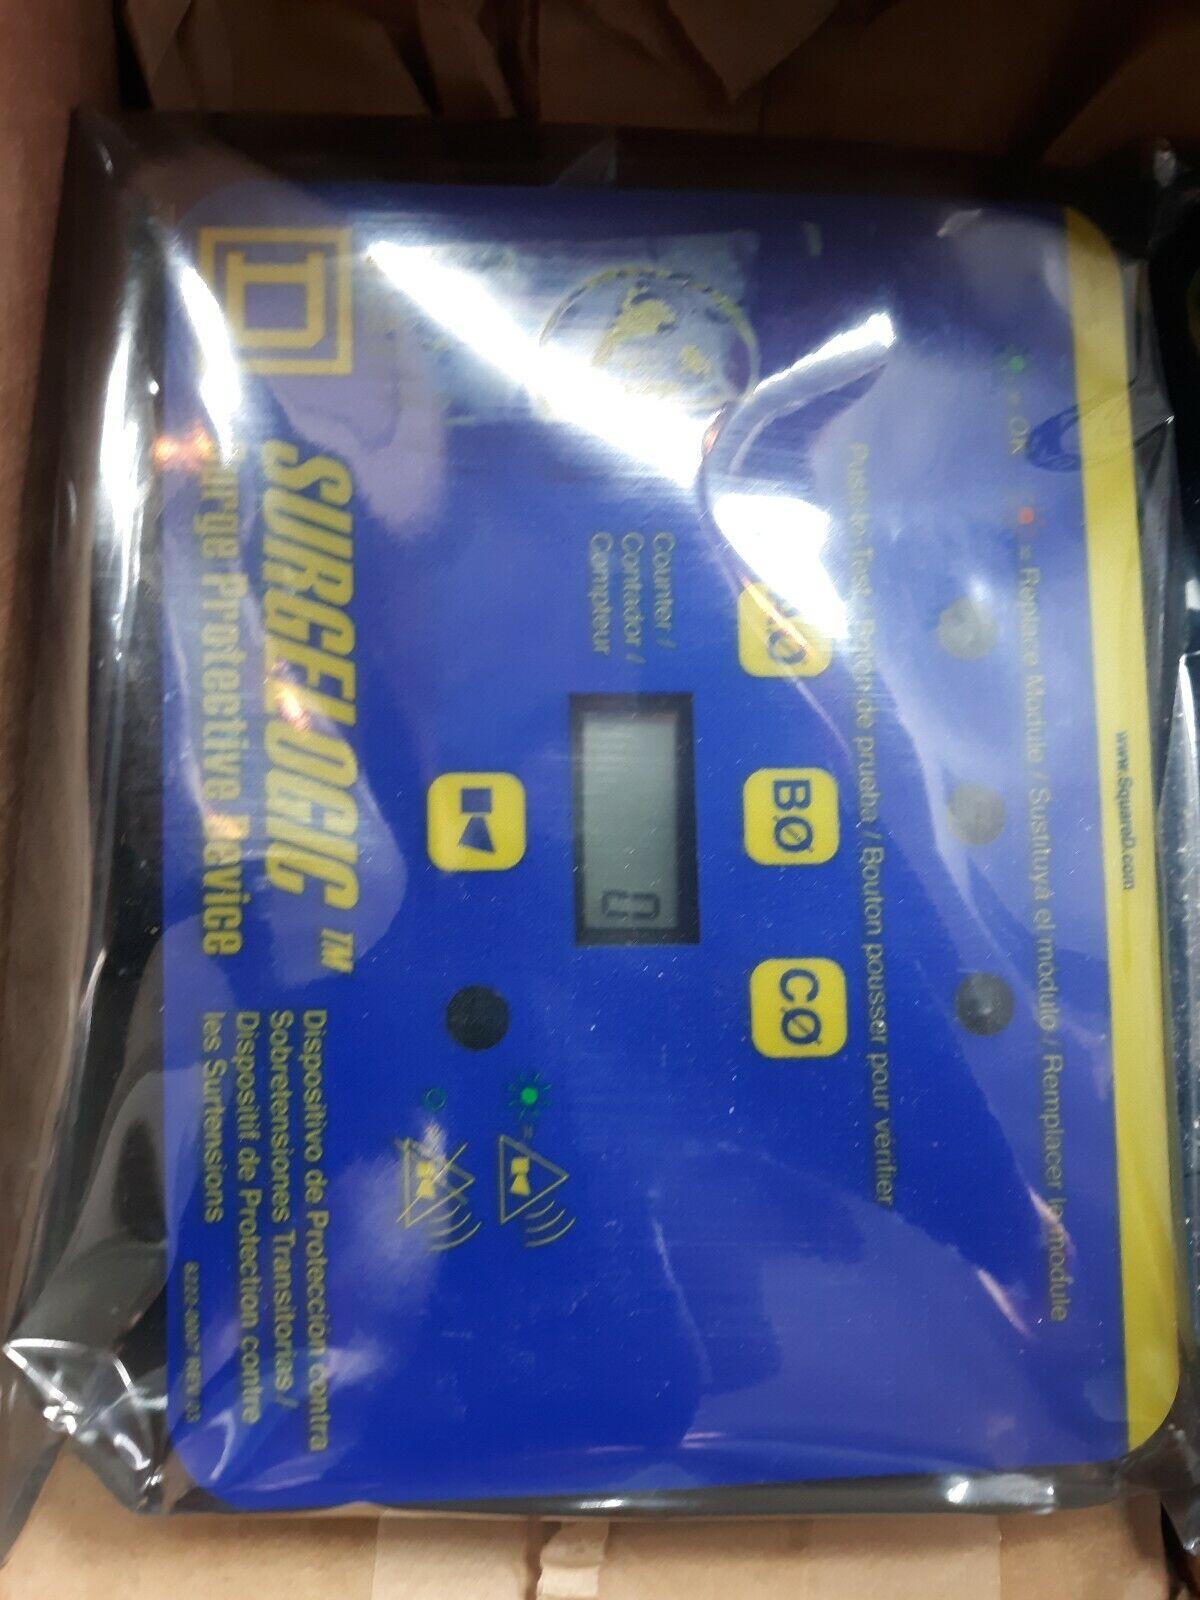 Square D TVS3DSPHC Surgelogic TVSS Display 3PH Counter Horizontal Schneider USED